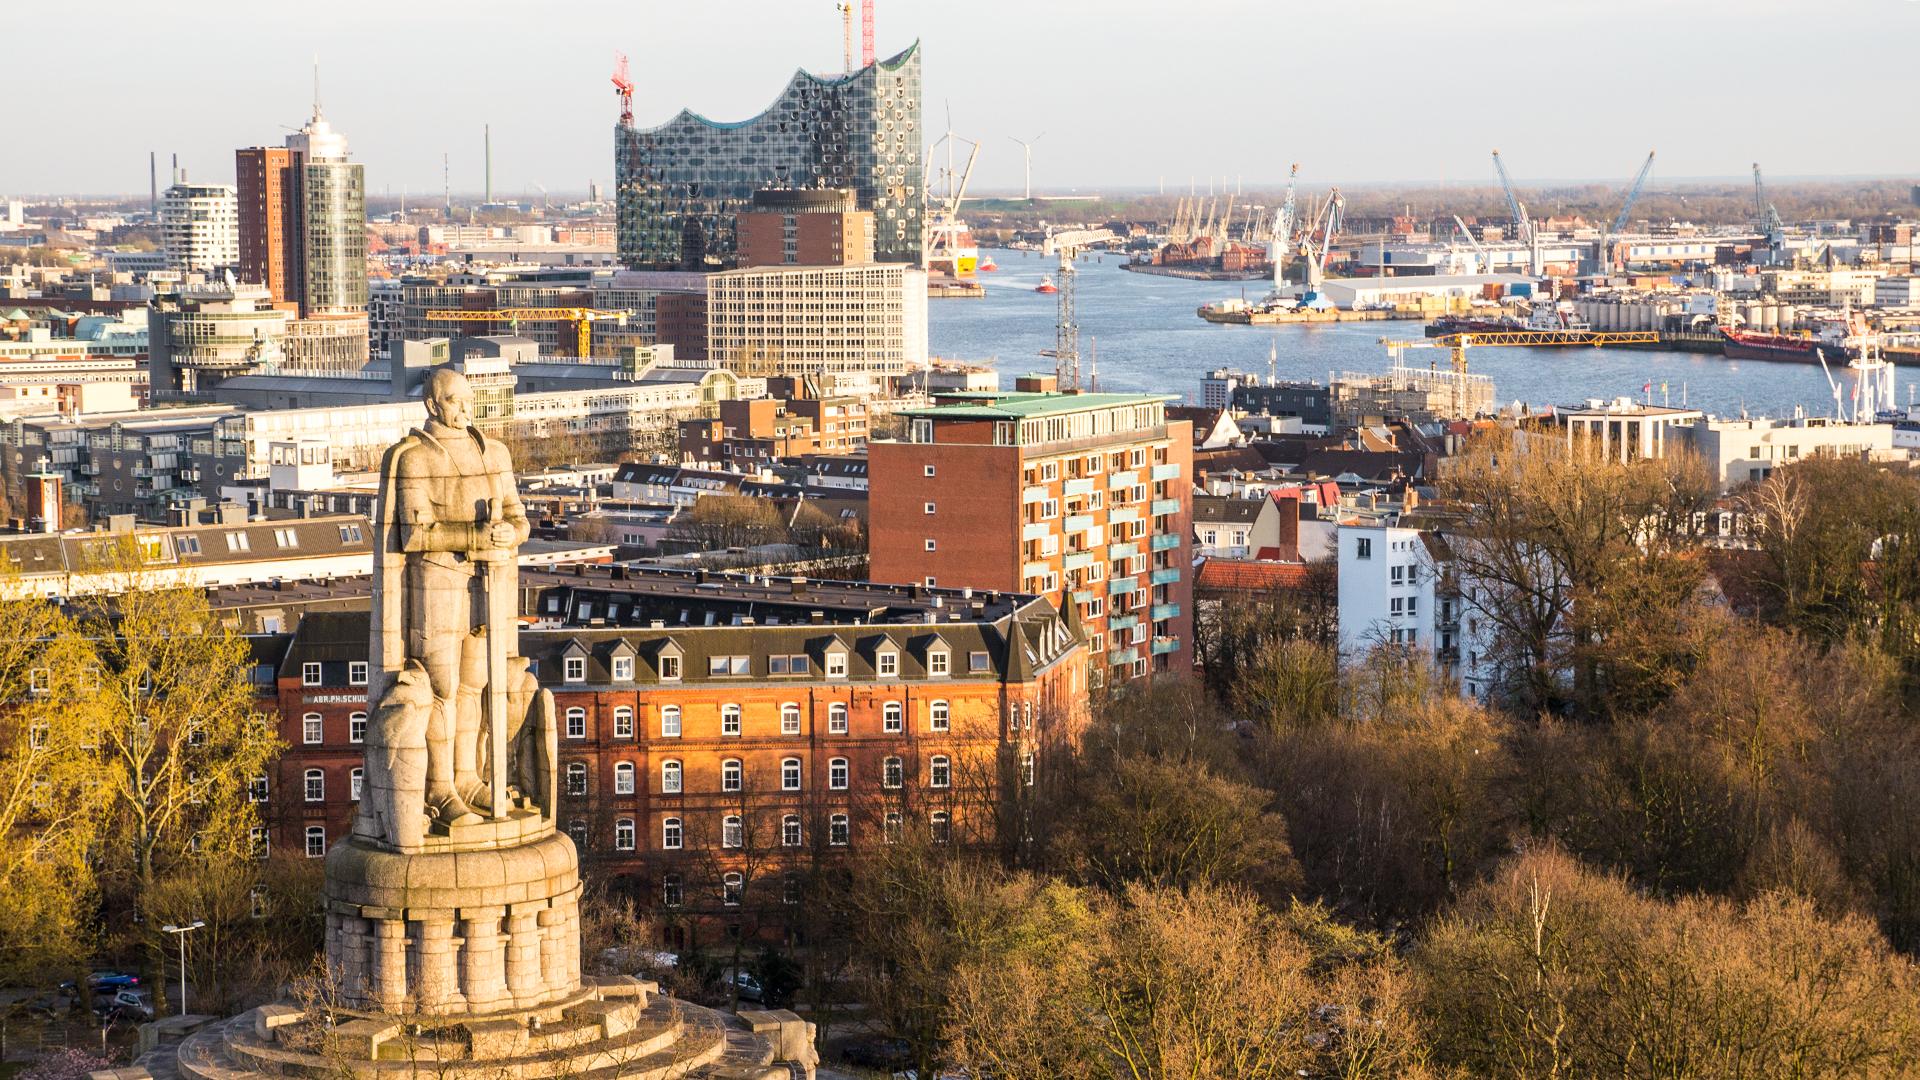 Das Bismarck-Denkmal in Hamburg